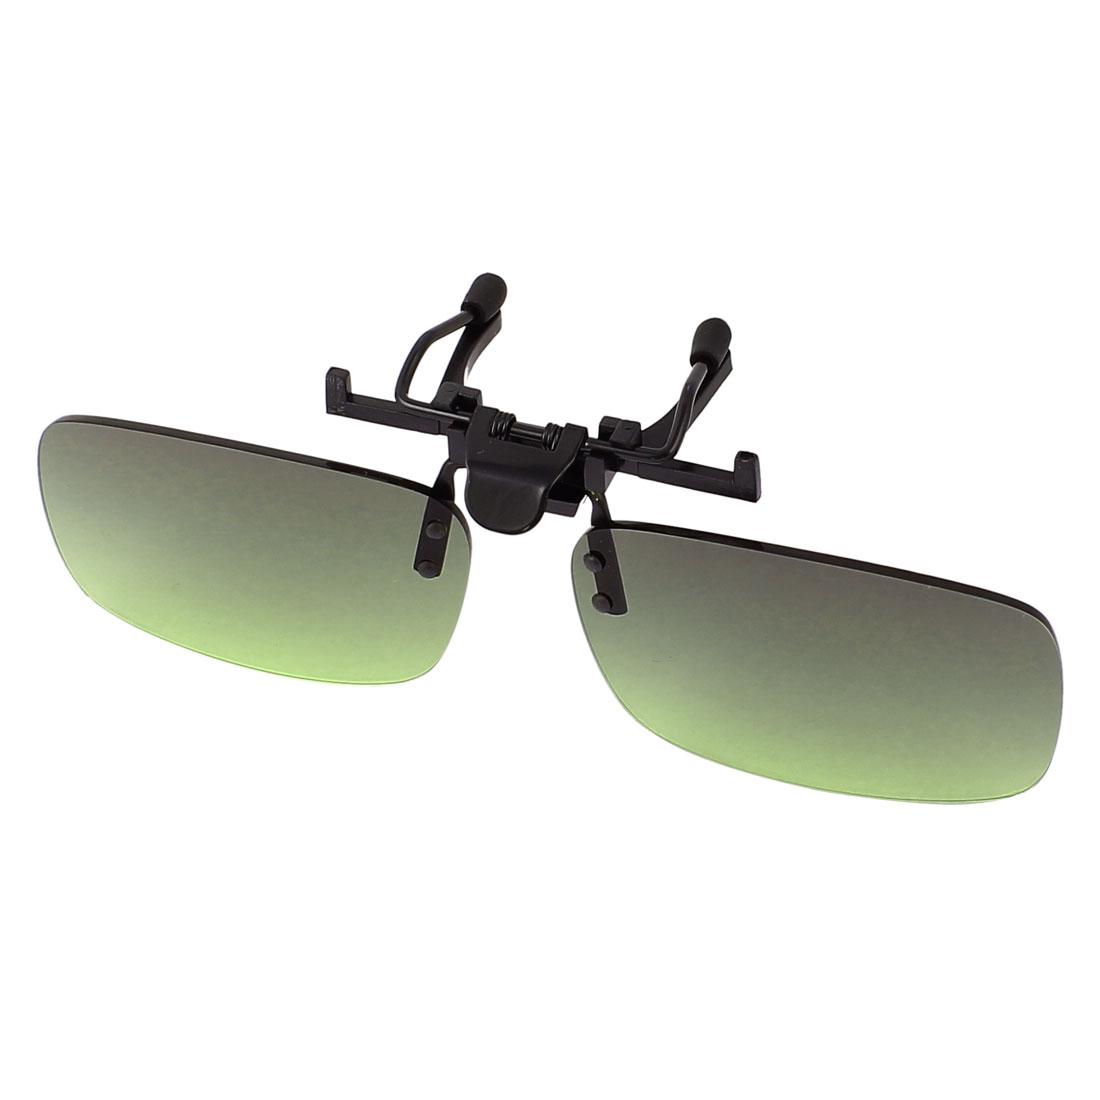 Green Lens Rimless Anti Glare Clip On Driving Sunglasses Eyeglasses 126 x 35mm